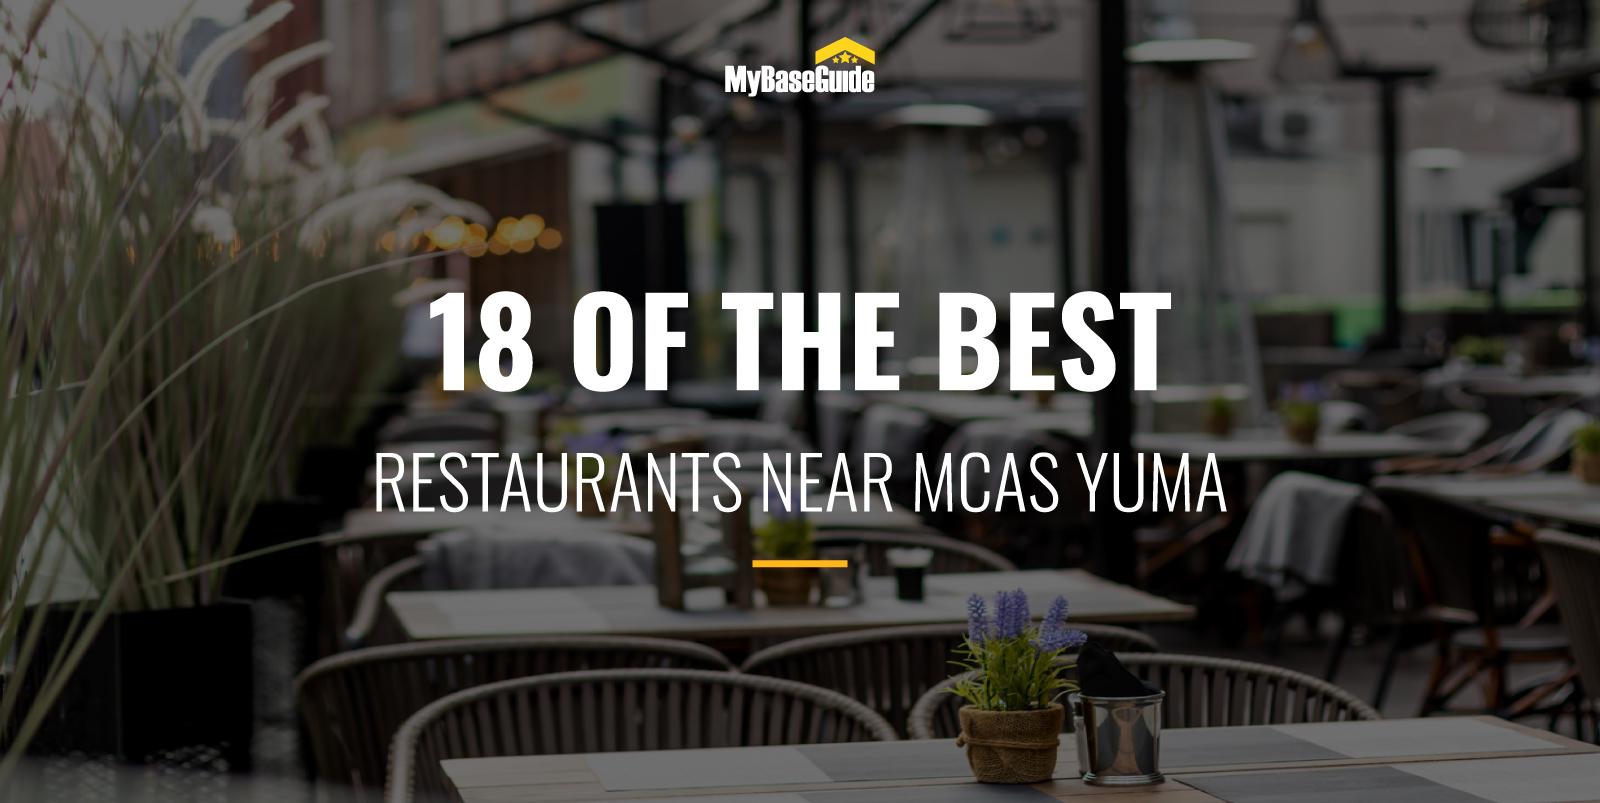 18 of the Best Restaurants Near MCAS Yuma